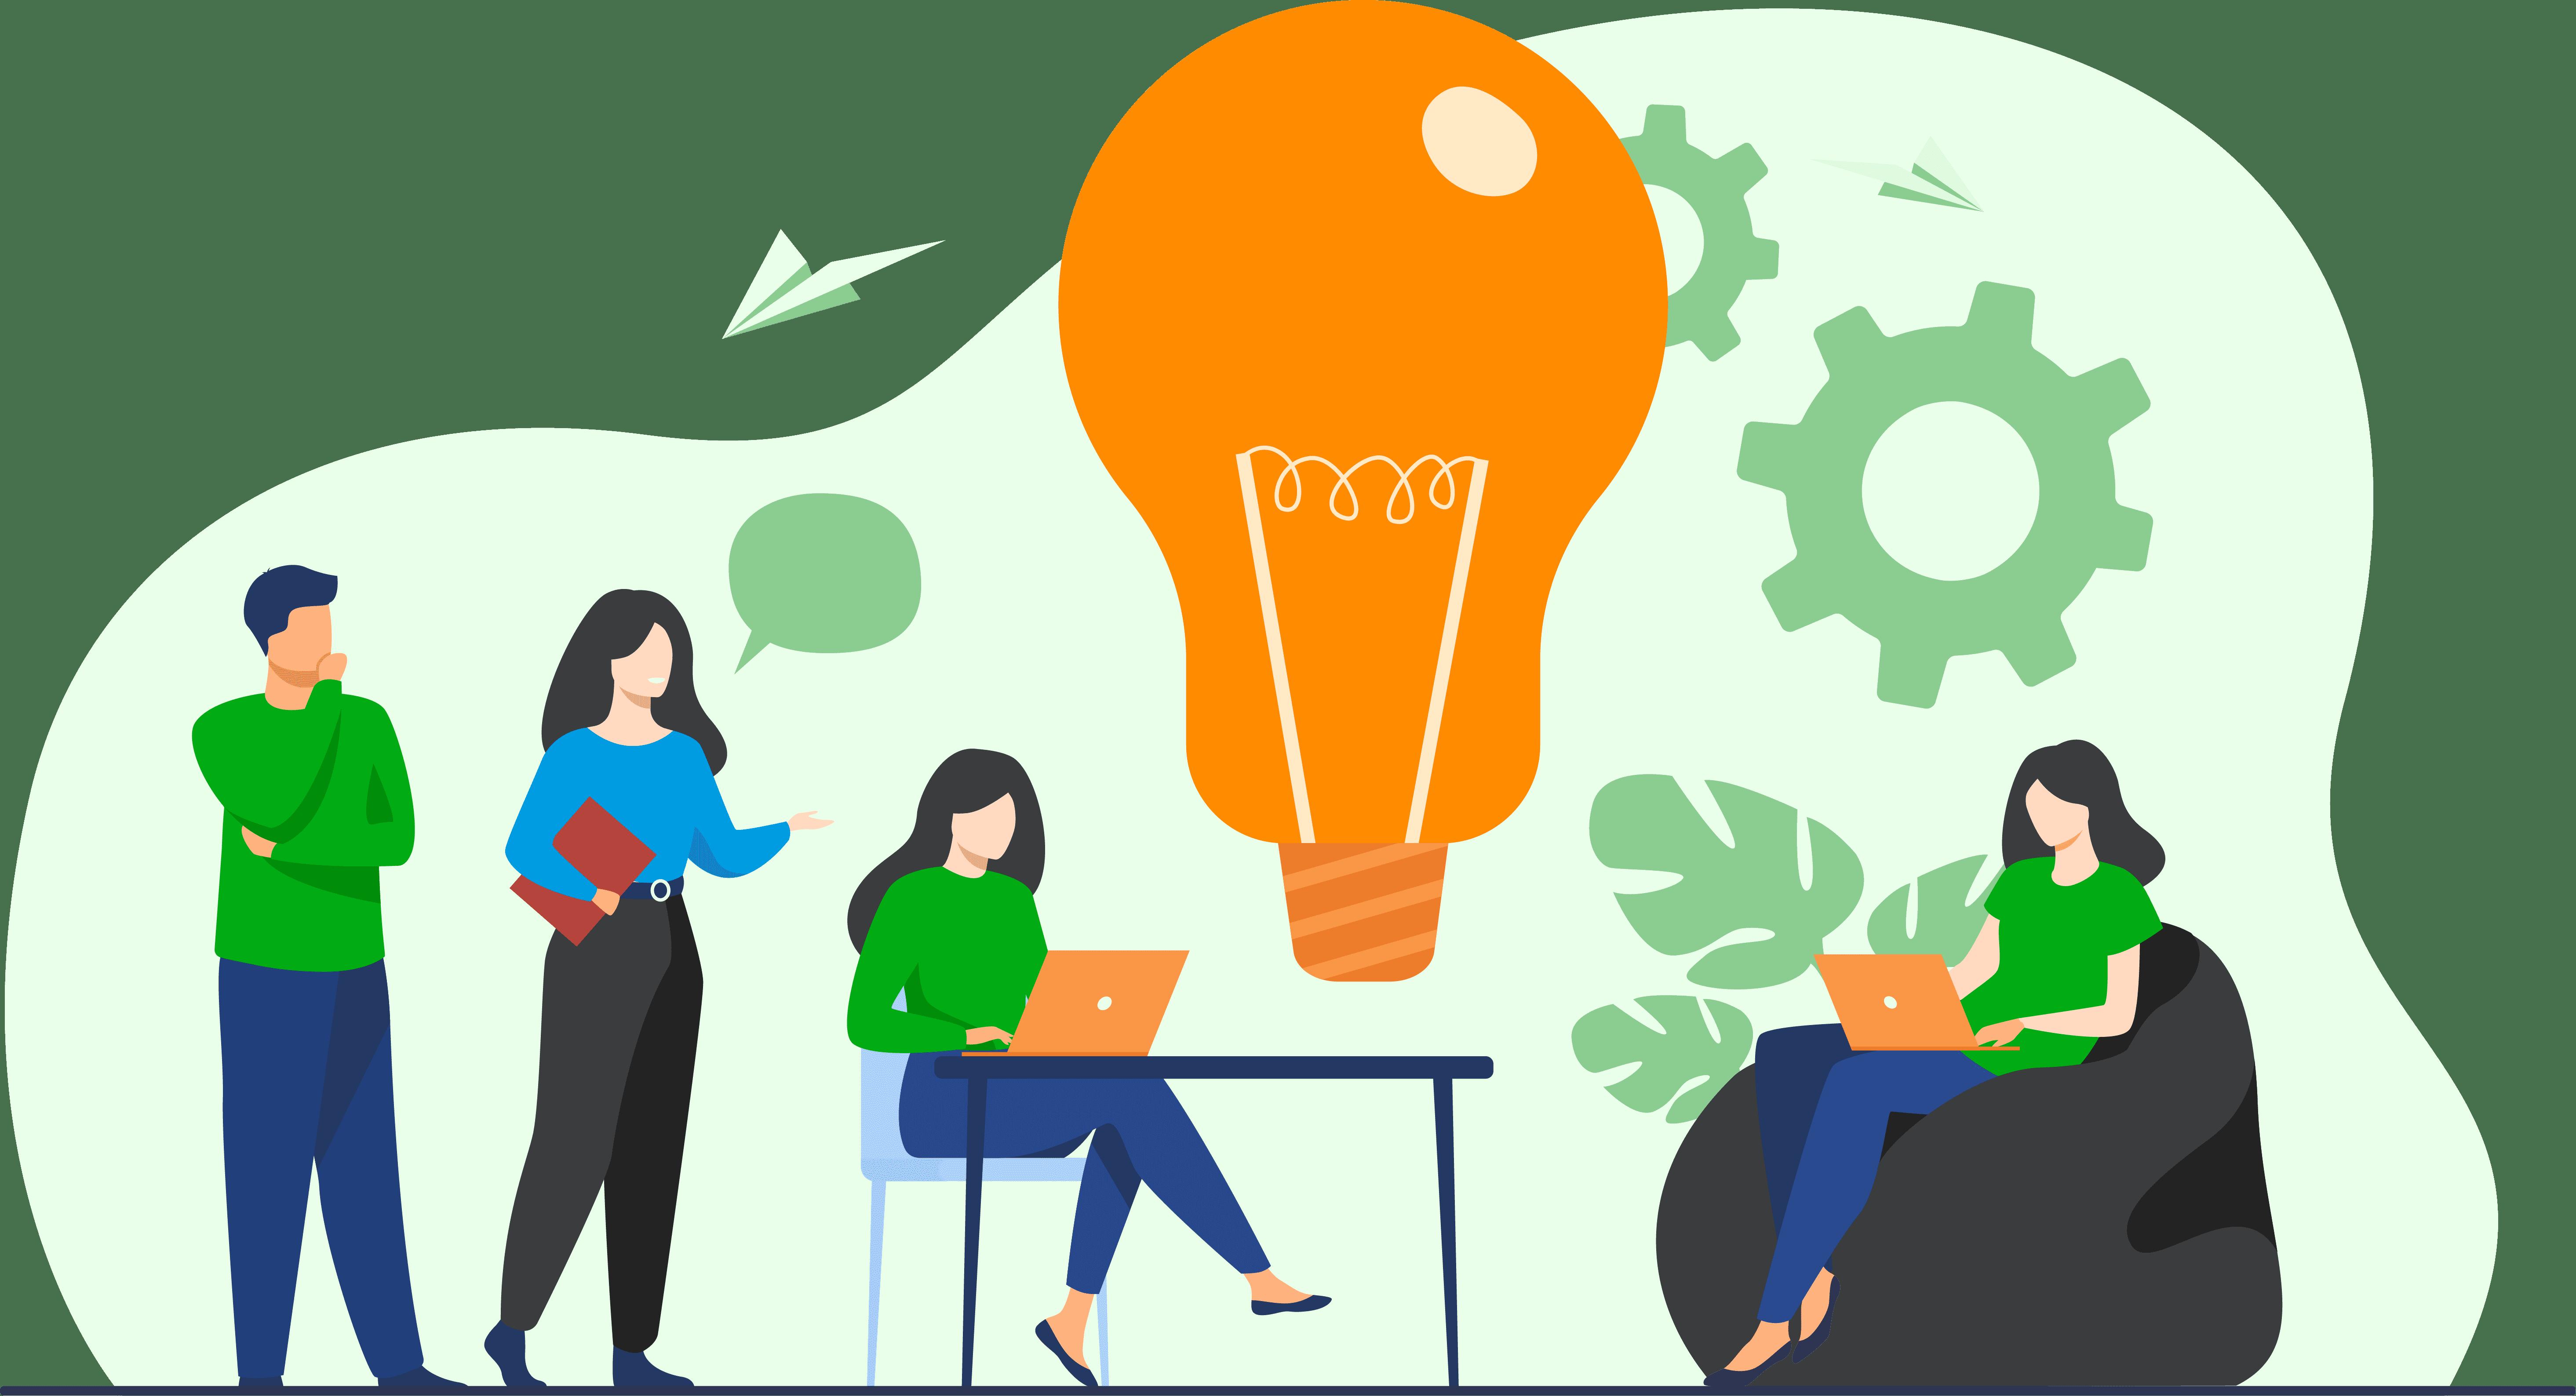 lightbulb meeting illustration